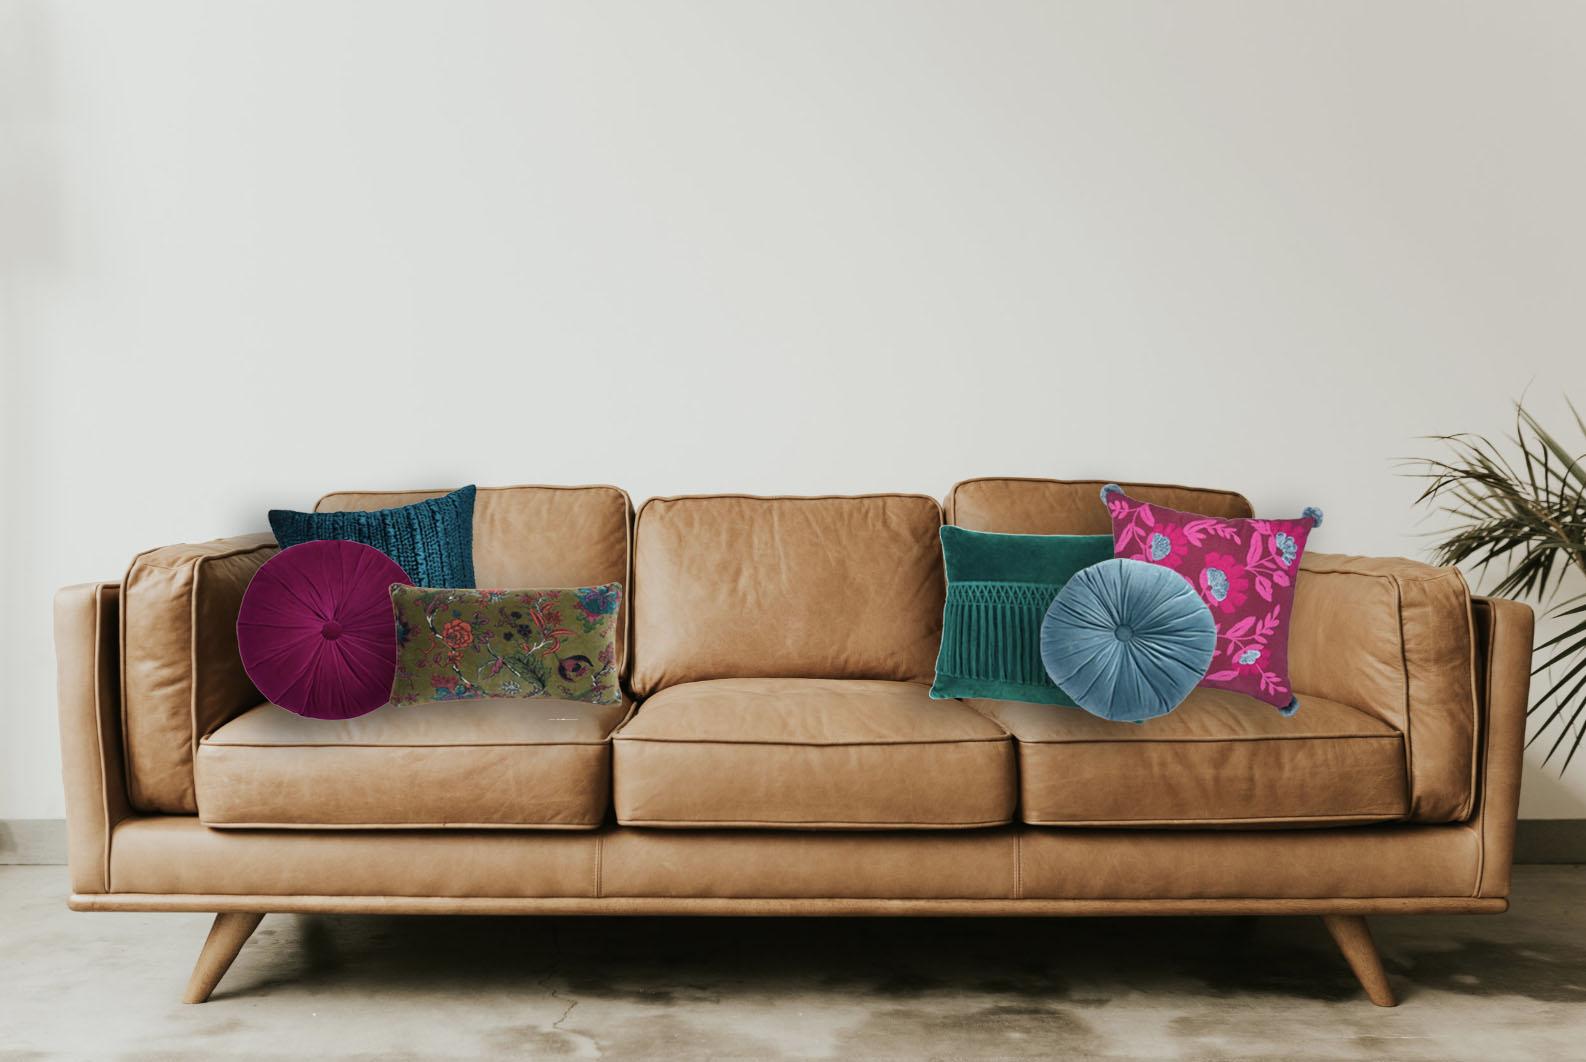 Couch_Glam Throw Pillows.jpg